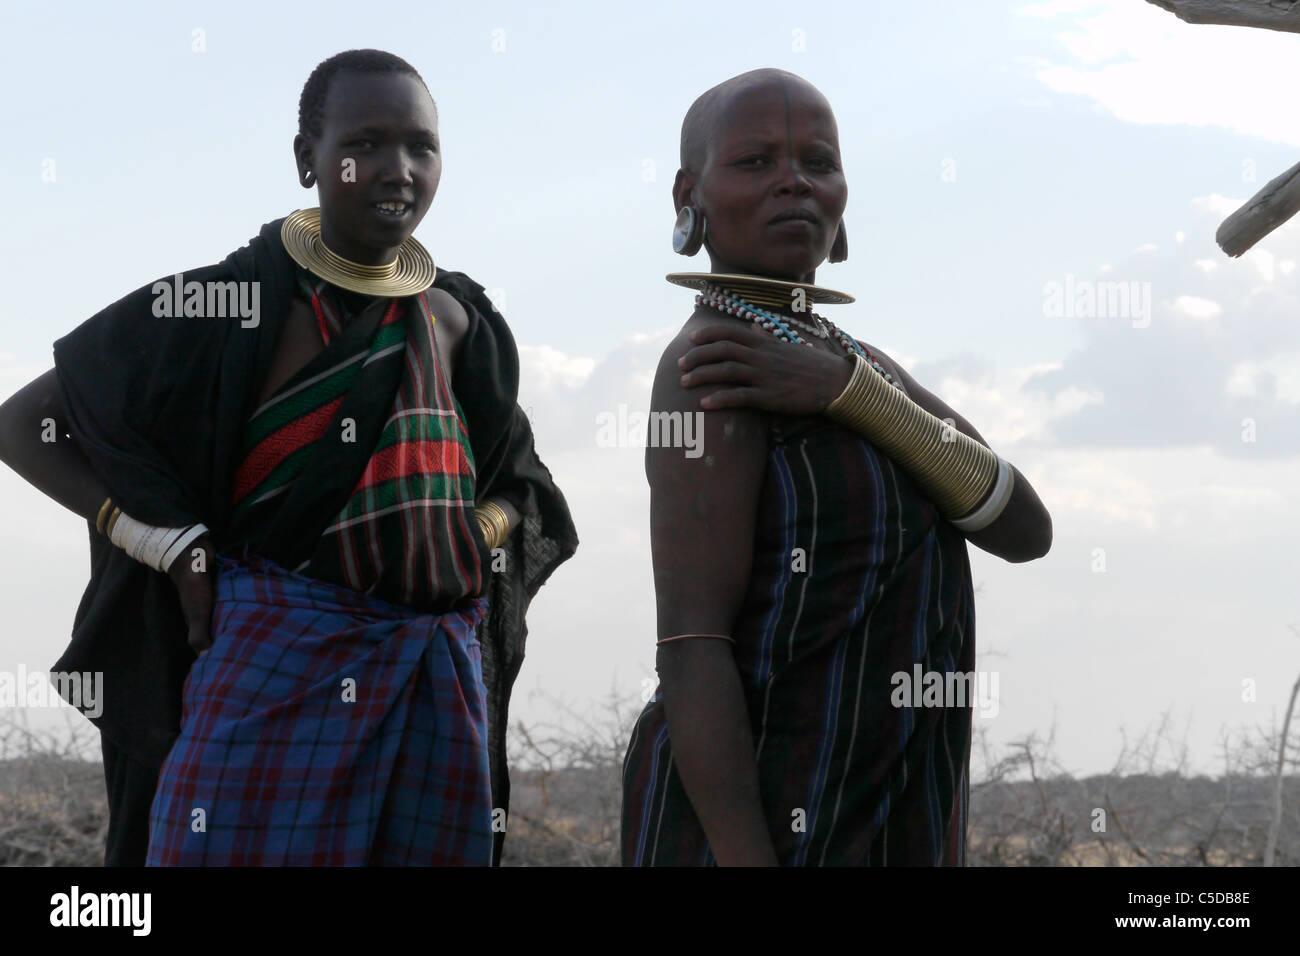 TANZANIA Watatulu tribesmen of Miyuguyu, Shinyanga district. Young and older woman. photograph by Sean Sprague Stock Photo